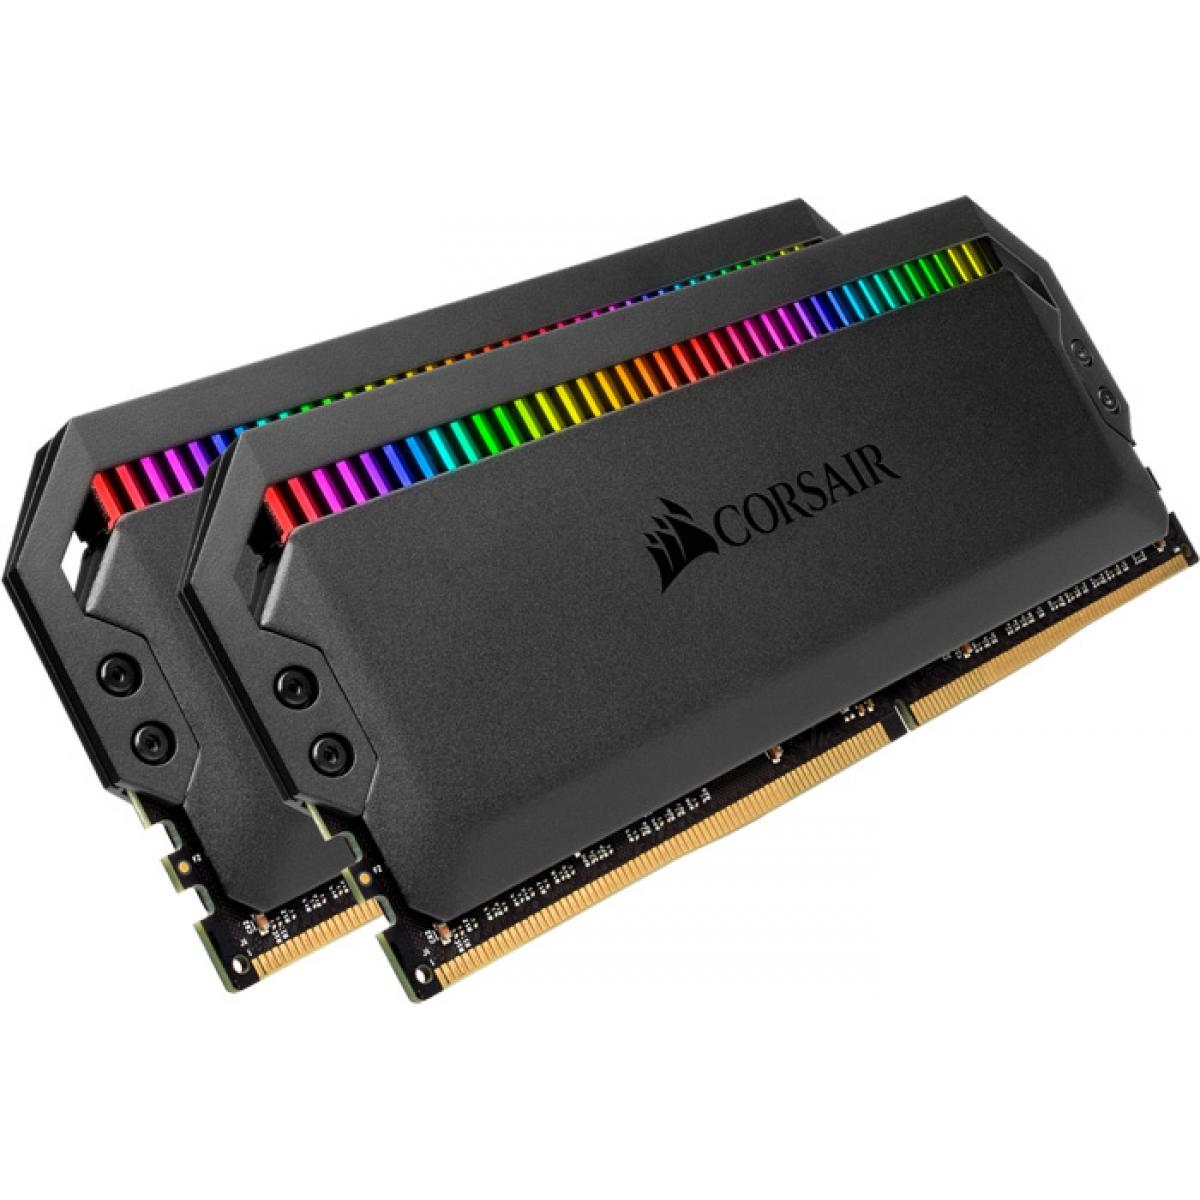 Memória DDR4 Corsair Dominator Platinum, RGB, 16GB (2x8GB), 3000MHz, CMT16GX4M2C3000C15